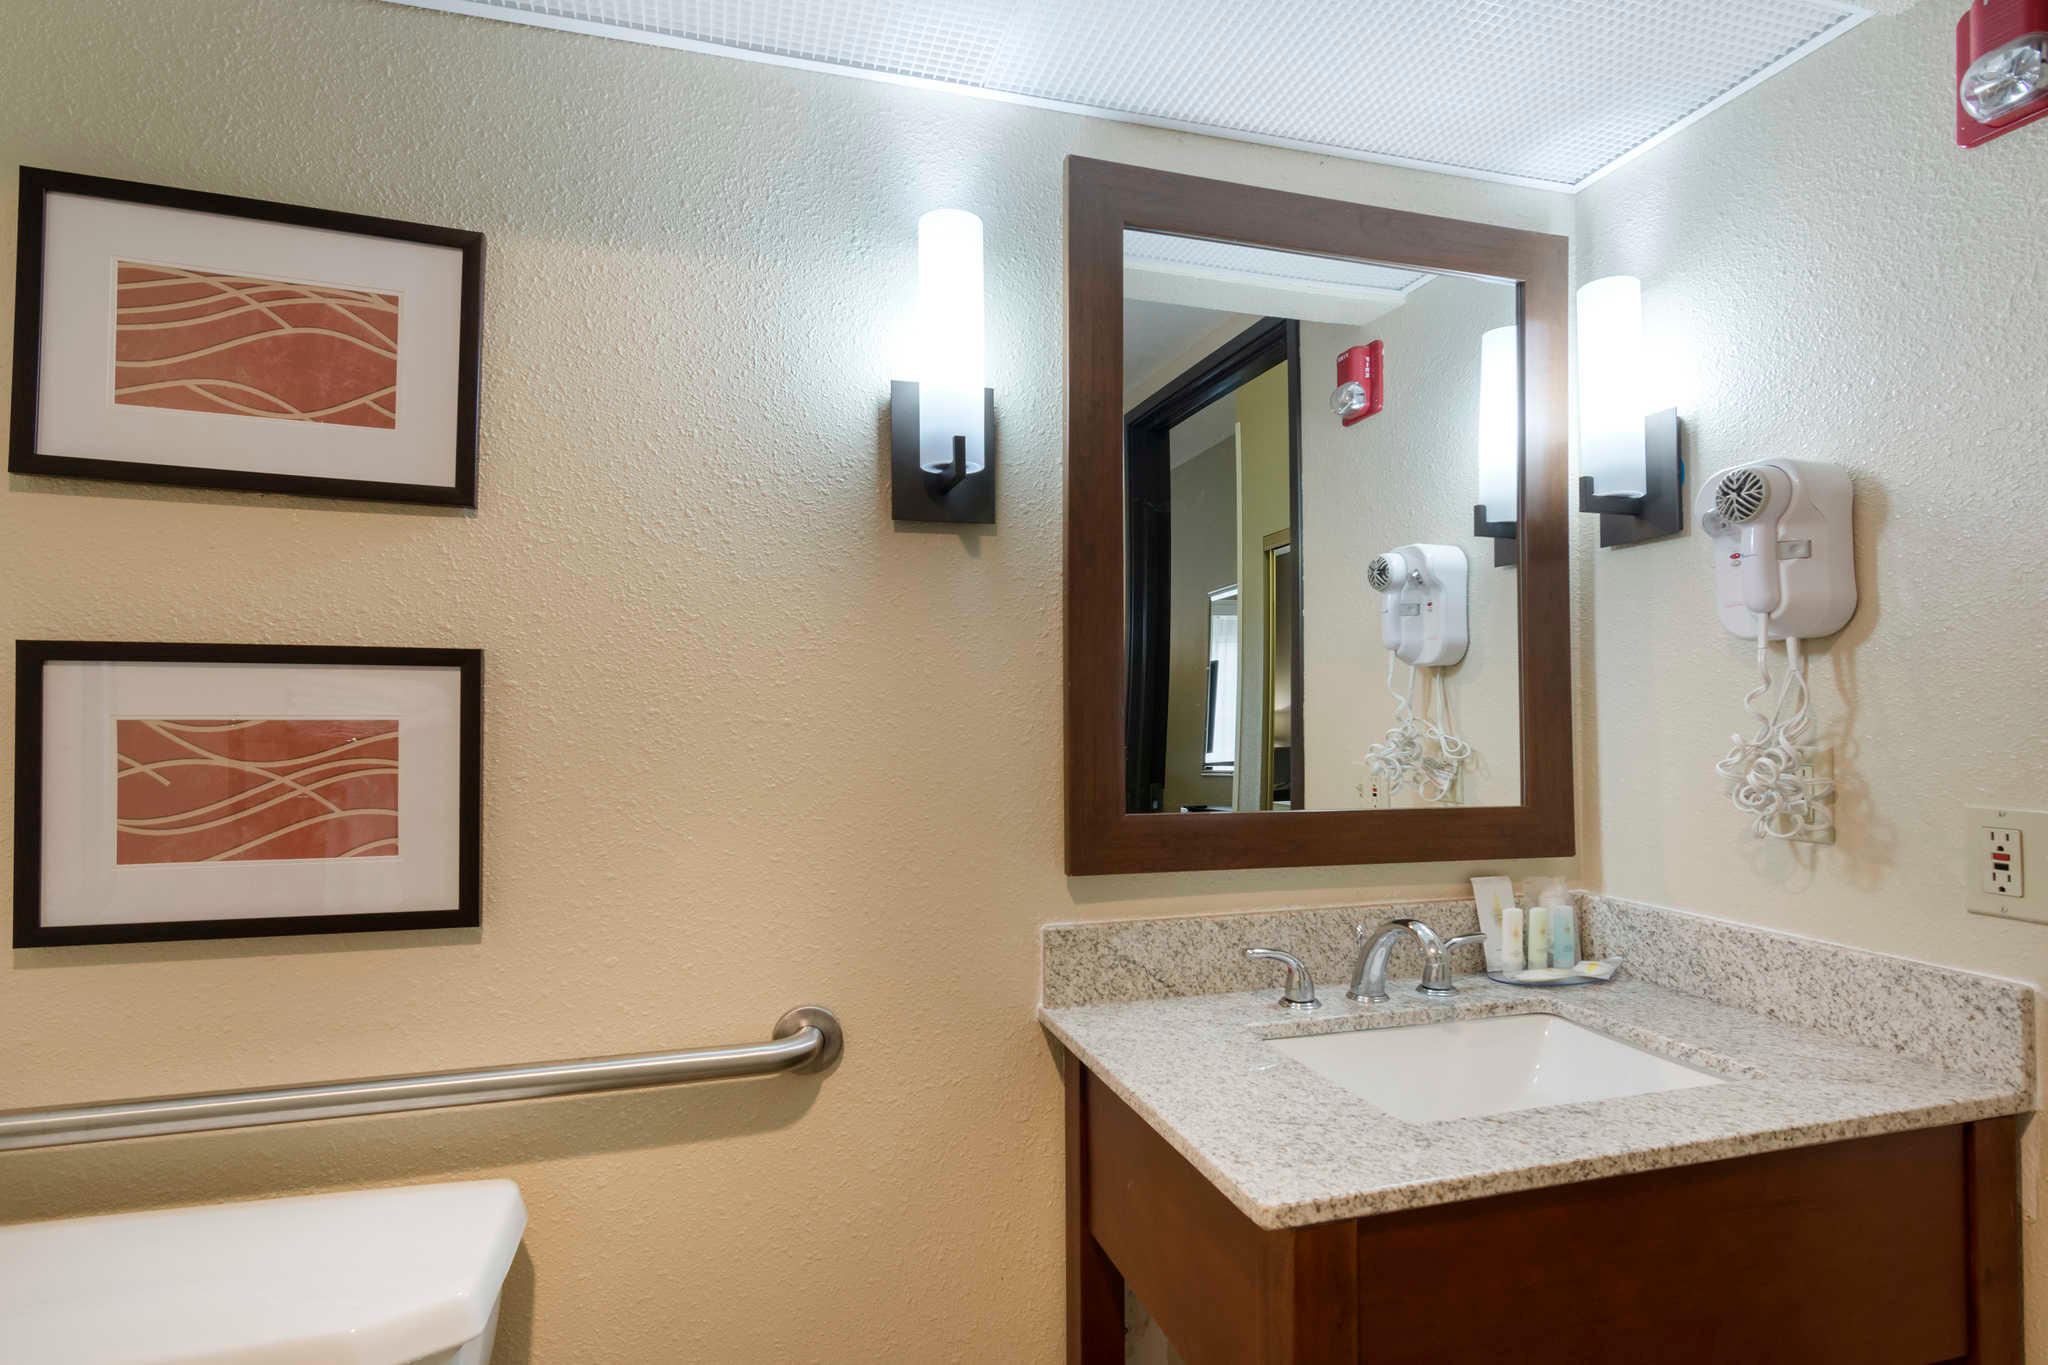 Comfort Inn & Suites Sacramento - University Area image 12